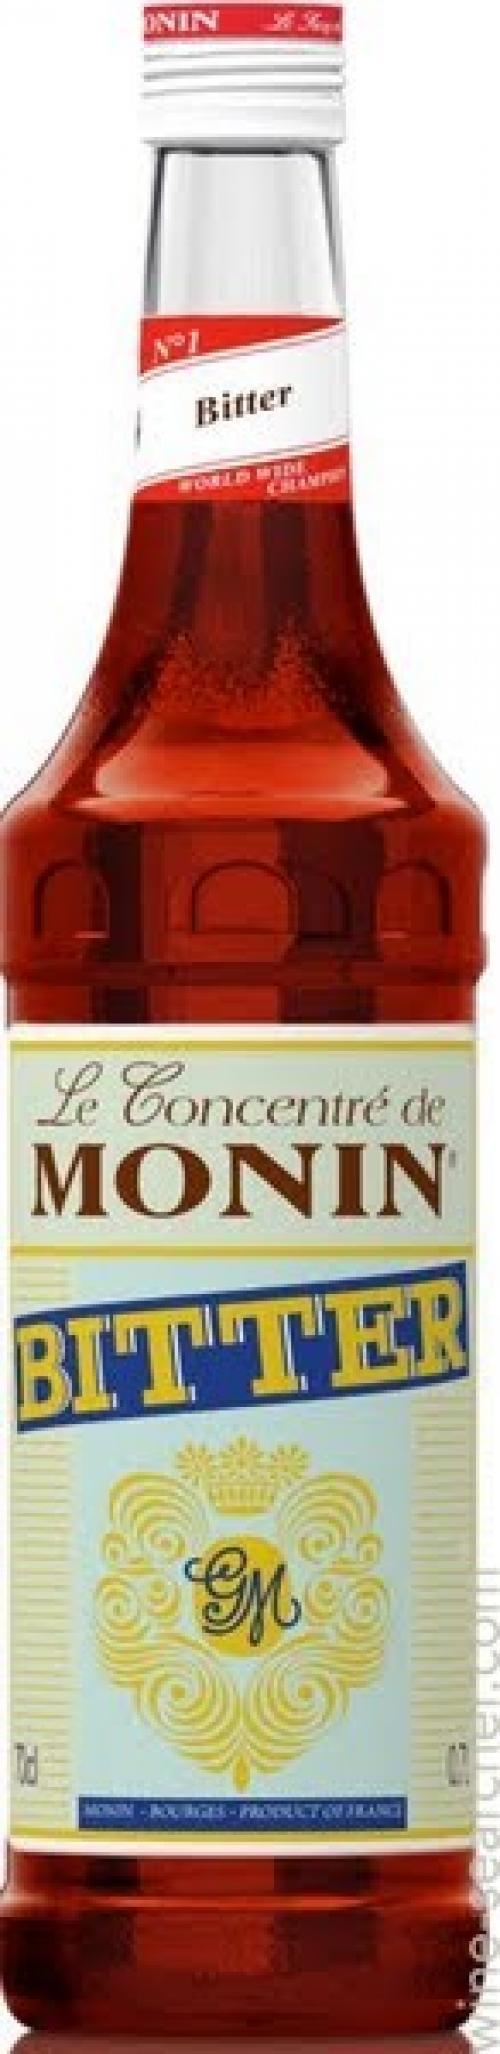 Monin Bitter | Csapolt.hu